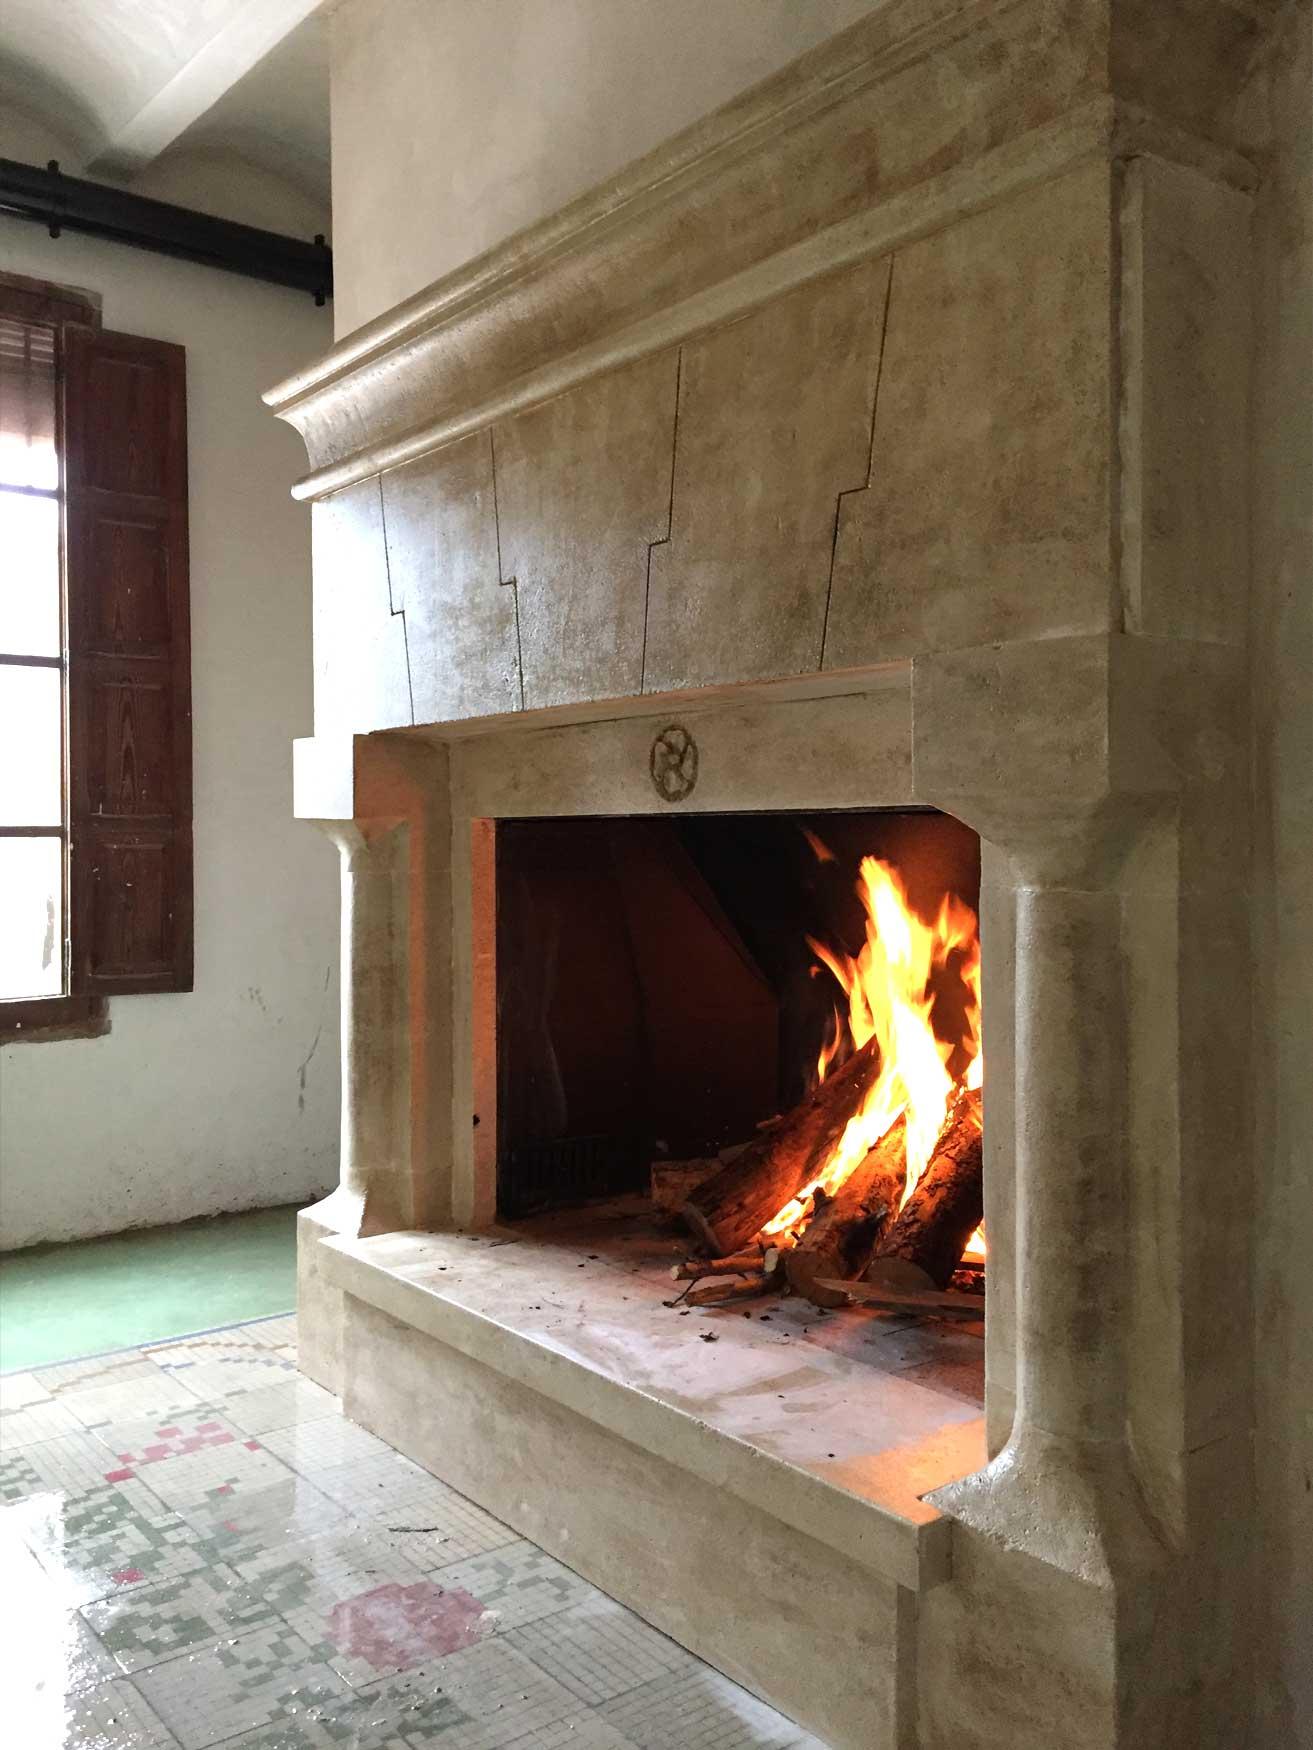 Chimeneas de lea madrid chimeneas rusticas de ladrillo for Chimeneas electricas baratas